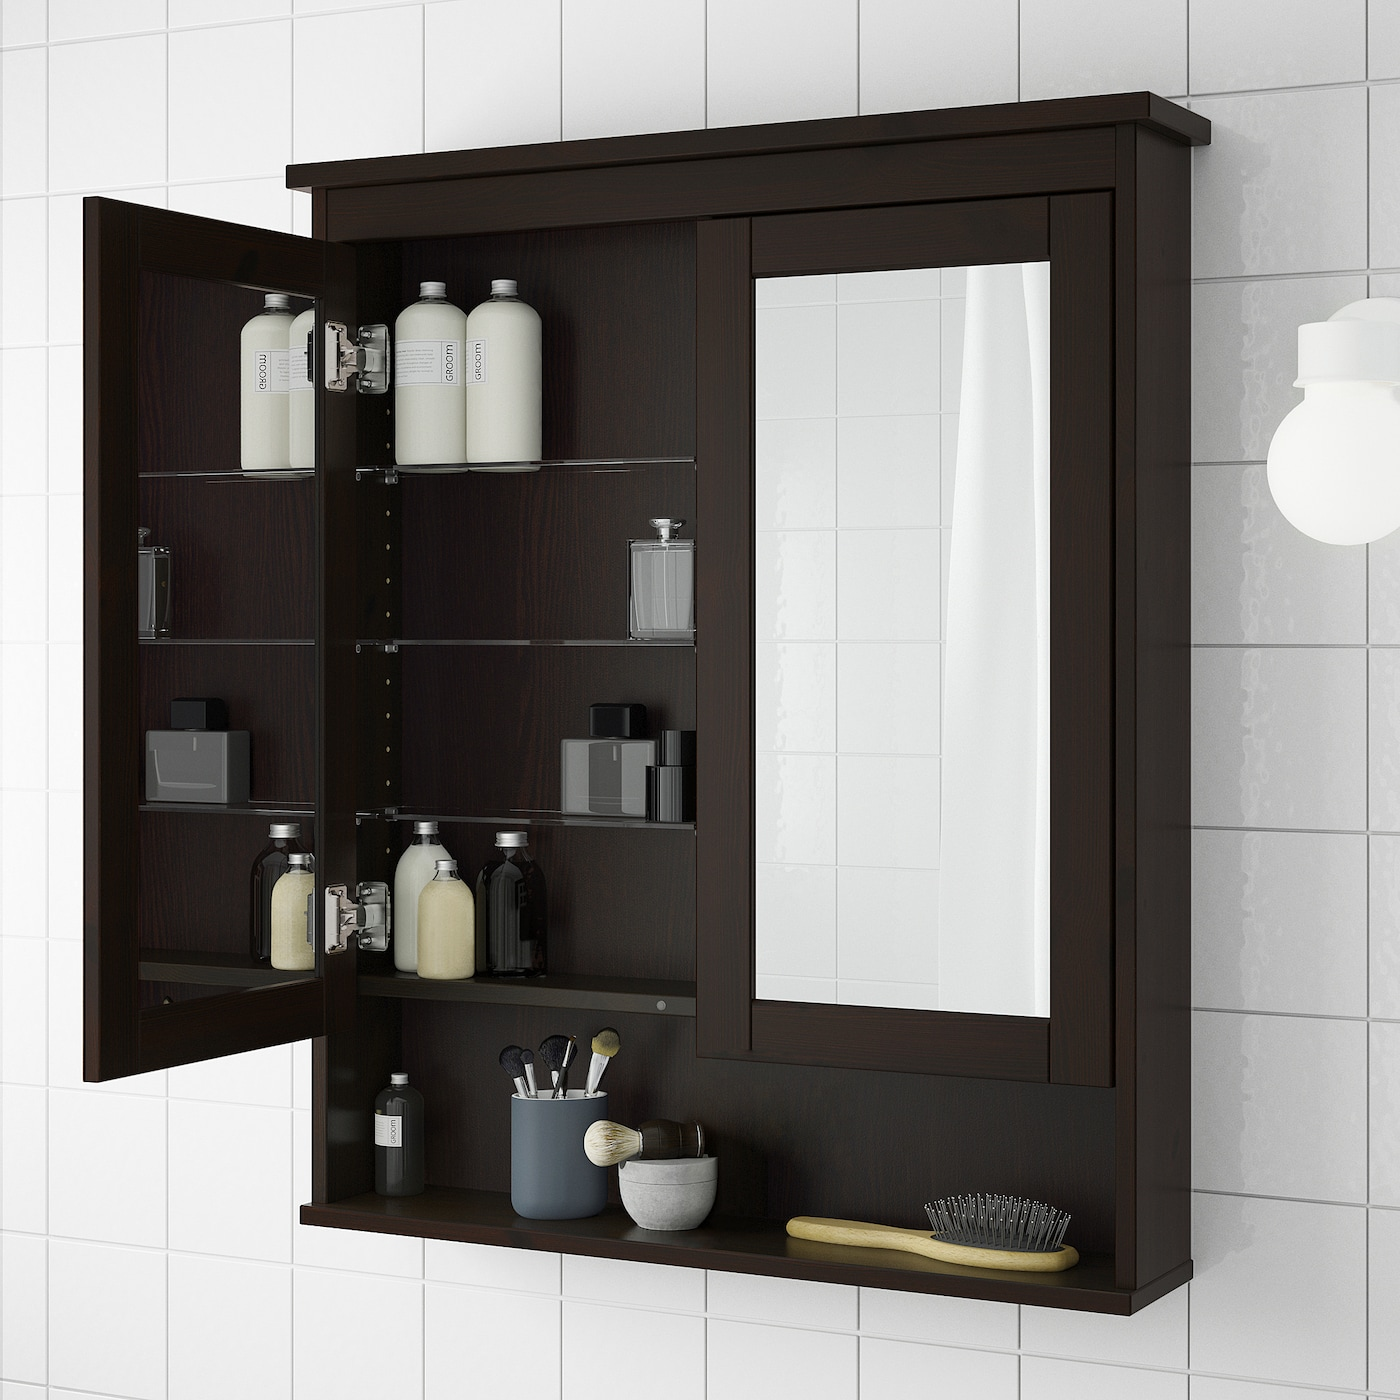 Hemnes Mirror Cabinet With 2 Doors Black Brown Stain 32 5 8x6 1 4x38 8 Ikea